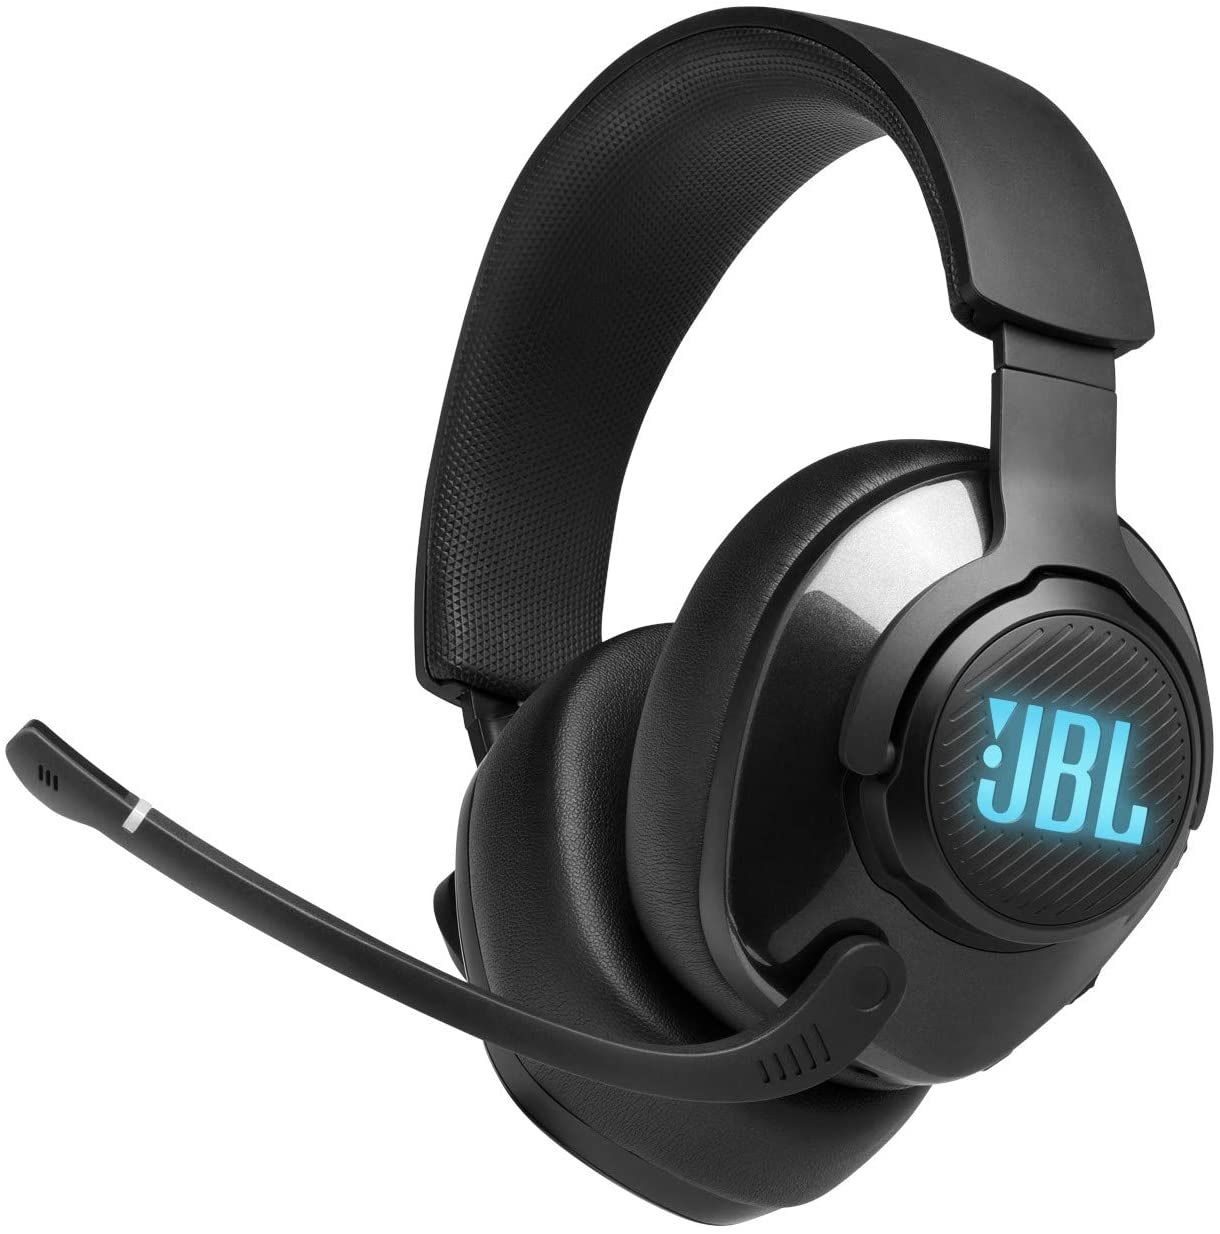 JBL Quantum 400 Wired Headphones